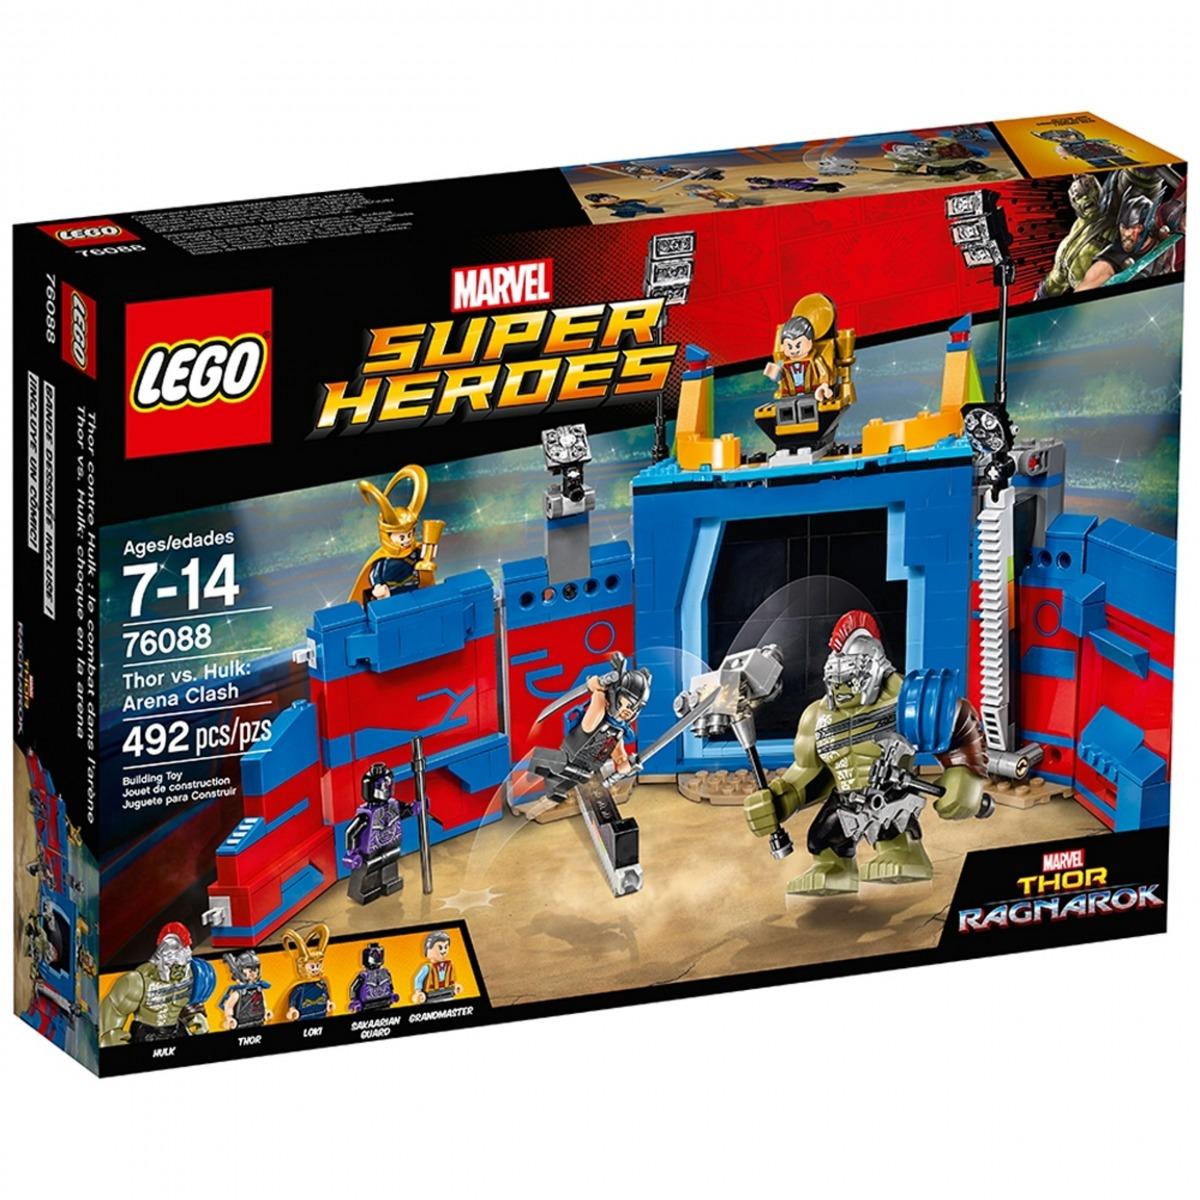 lego 76088 thor mot hulk arenadrabbning scaled